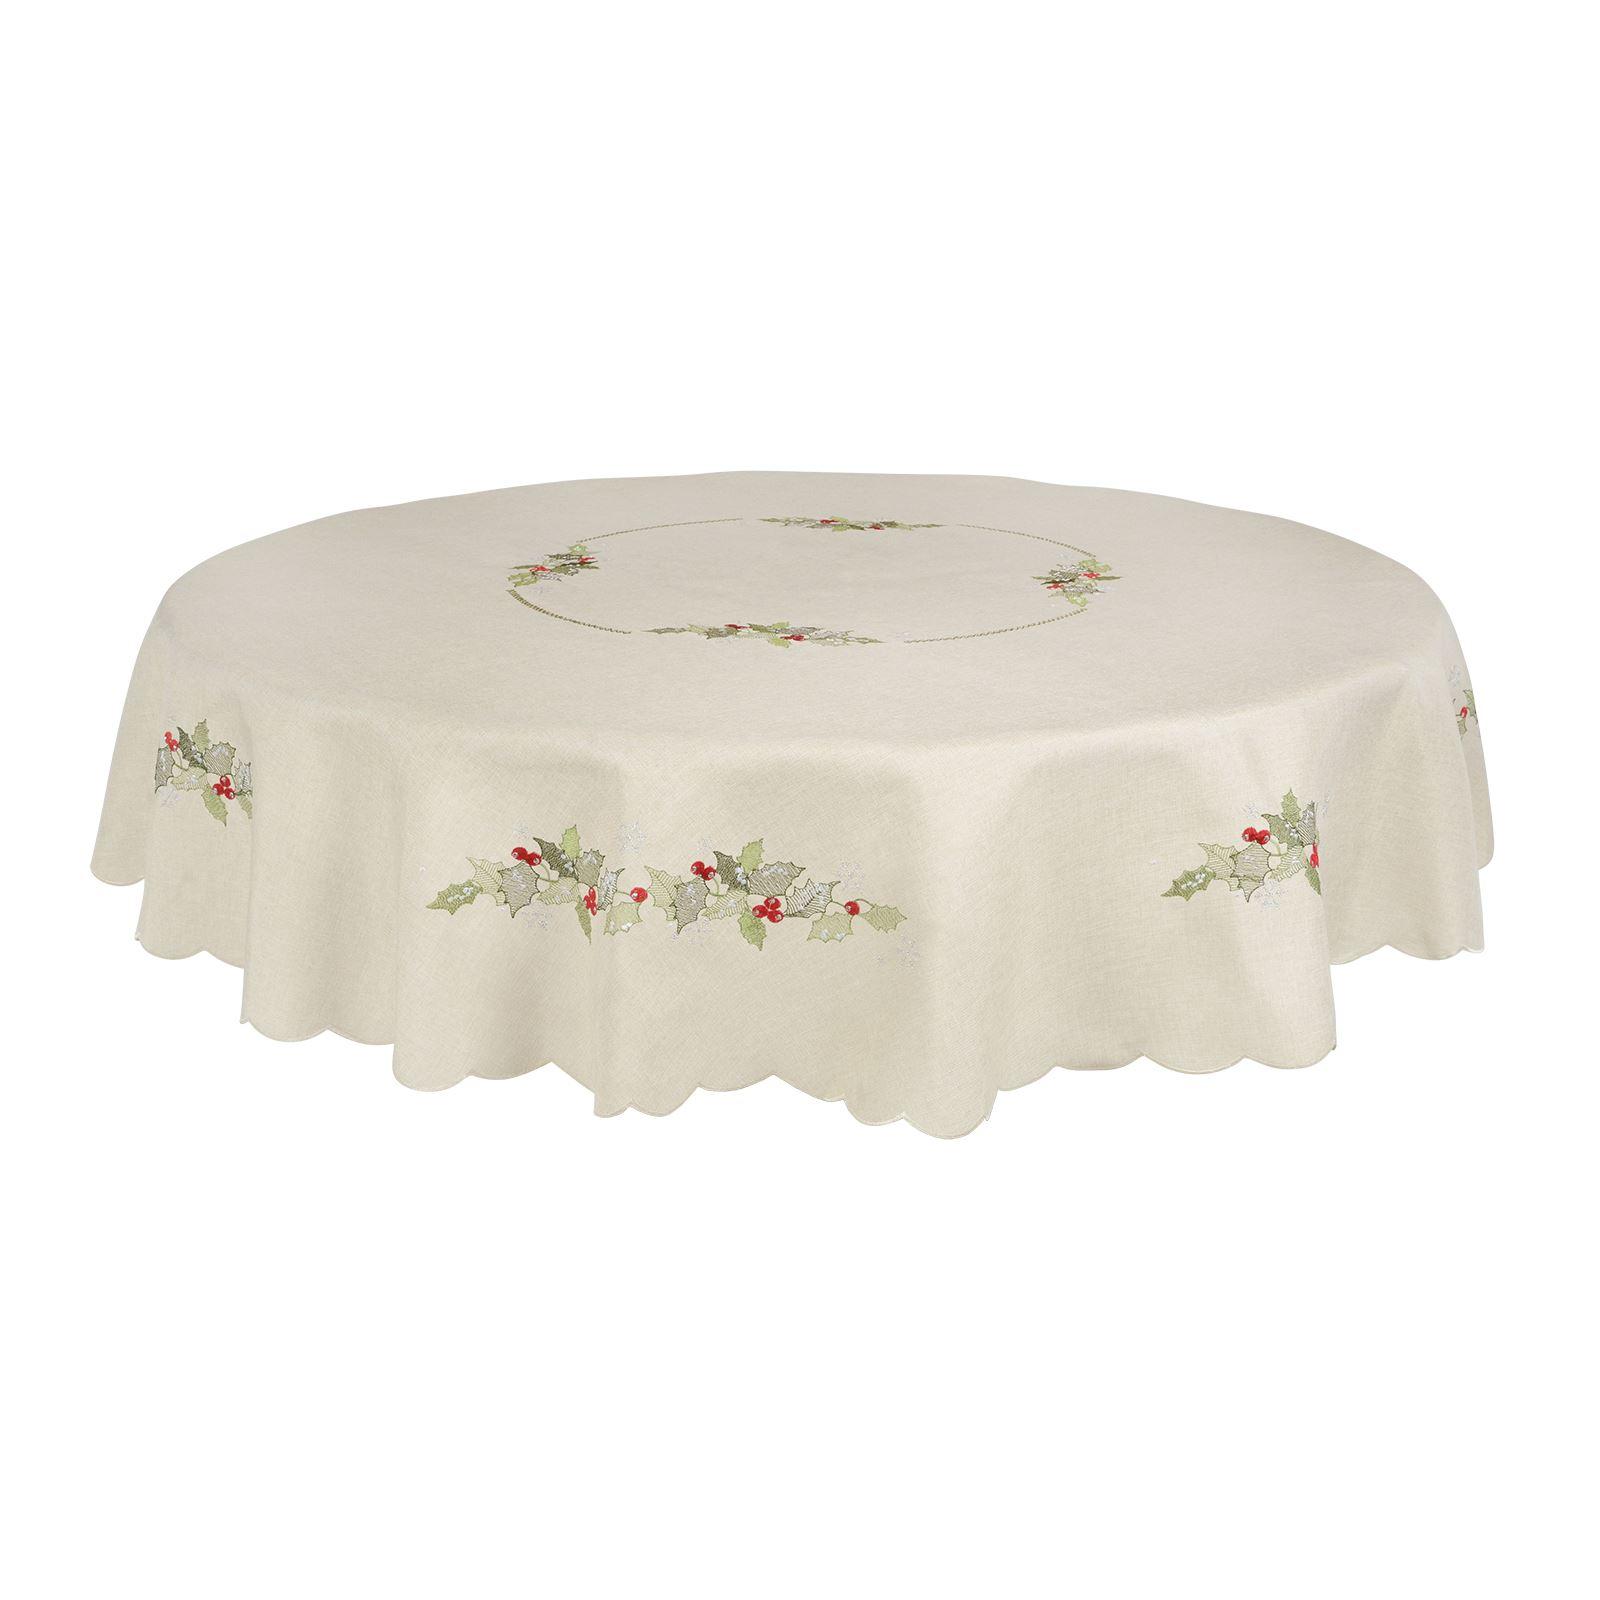 Christmas-Tablecloth-Festive-Pattern-Rectangle-Round-Fabric-Xmas-Room-Decoration Indexbild 83